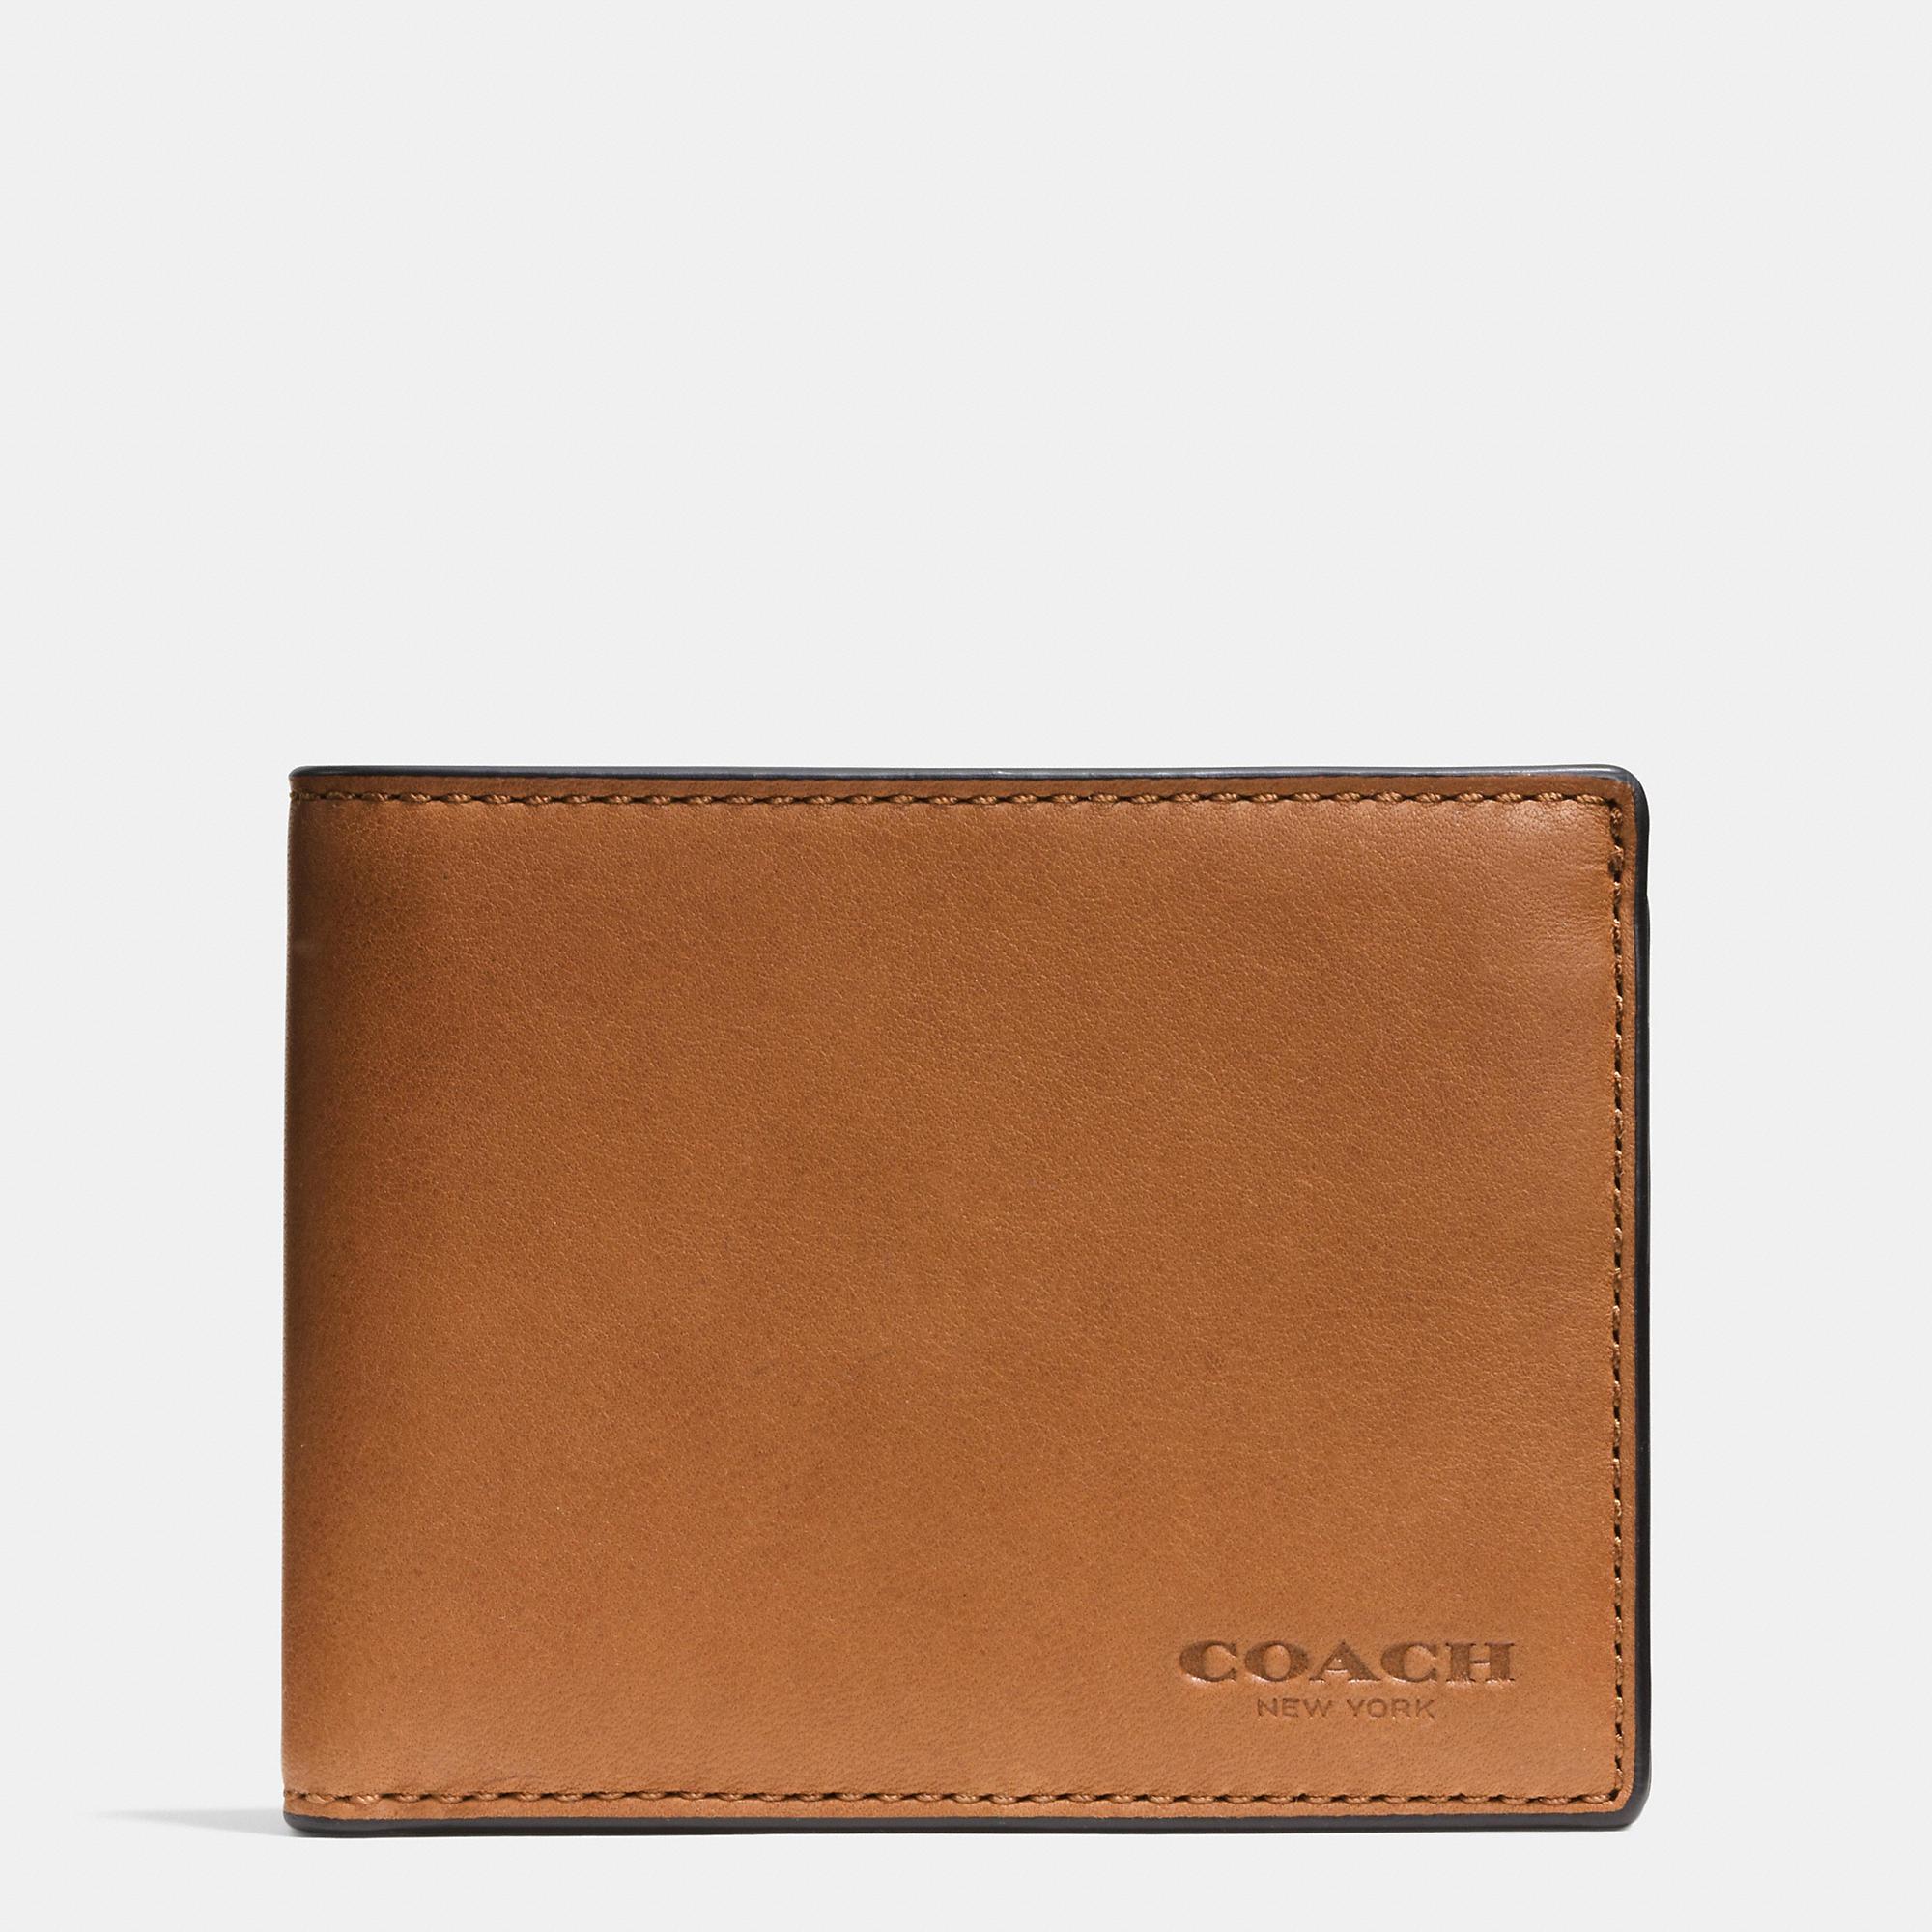 6643da4a175da ... official store lyst coach slim billfold id wallet in sport calf leather  for men 48a28 9dce9